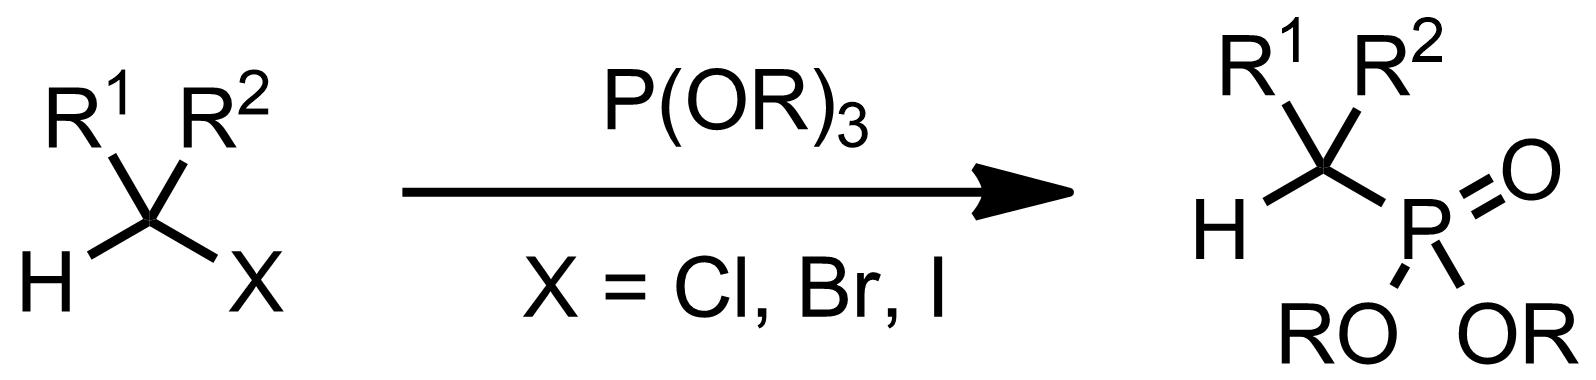 Schematic representation of the Michaelis-Arbuzov Reaction.